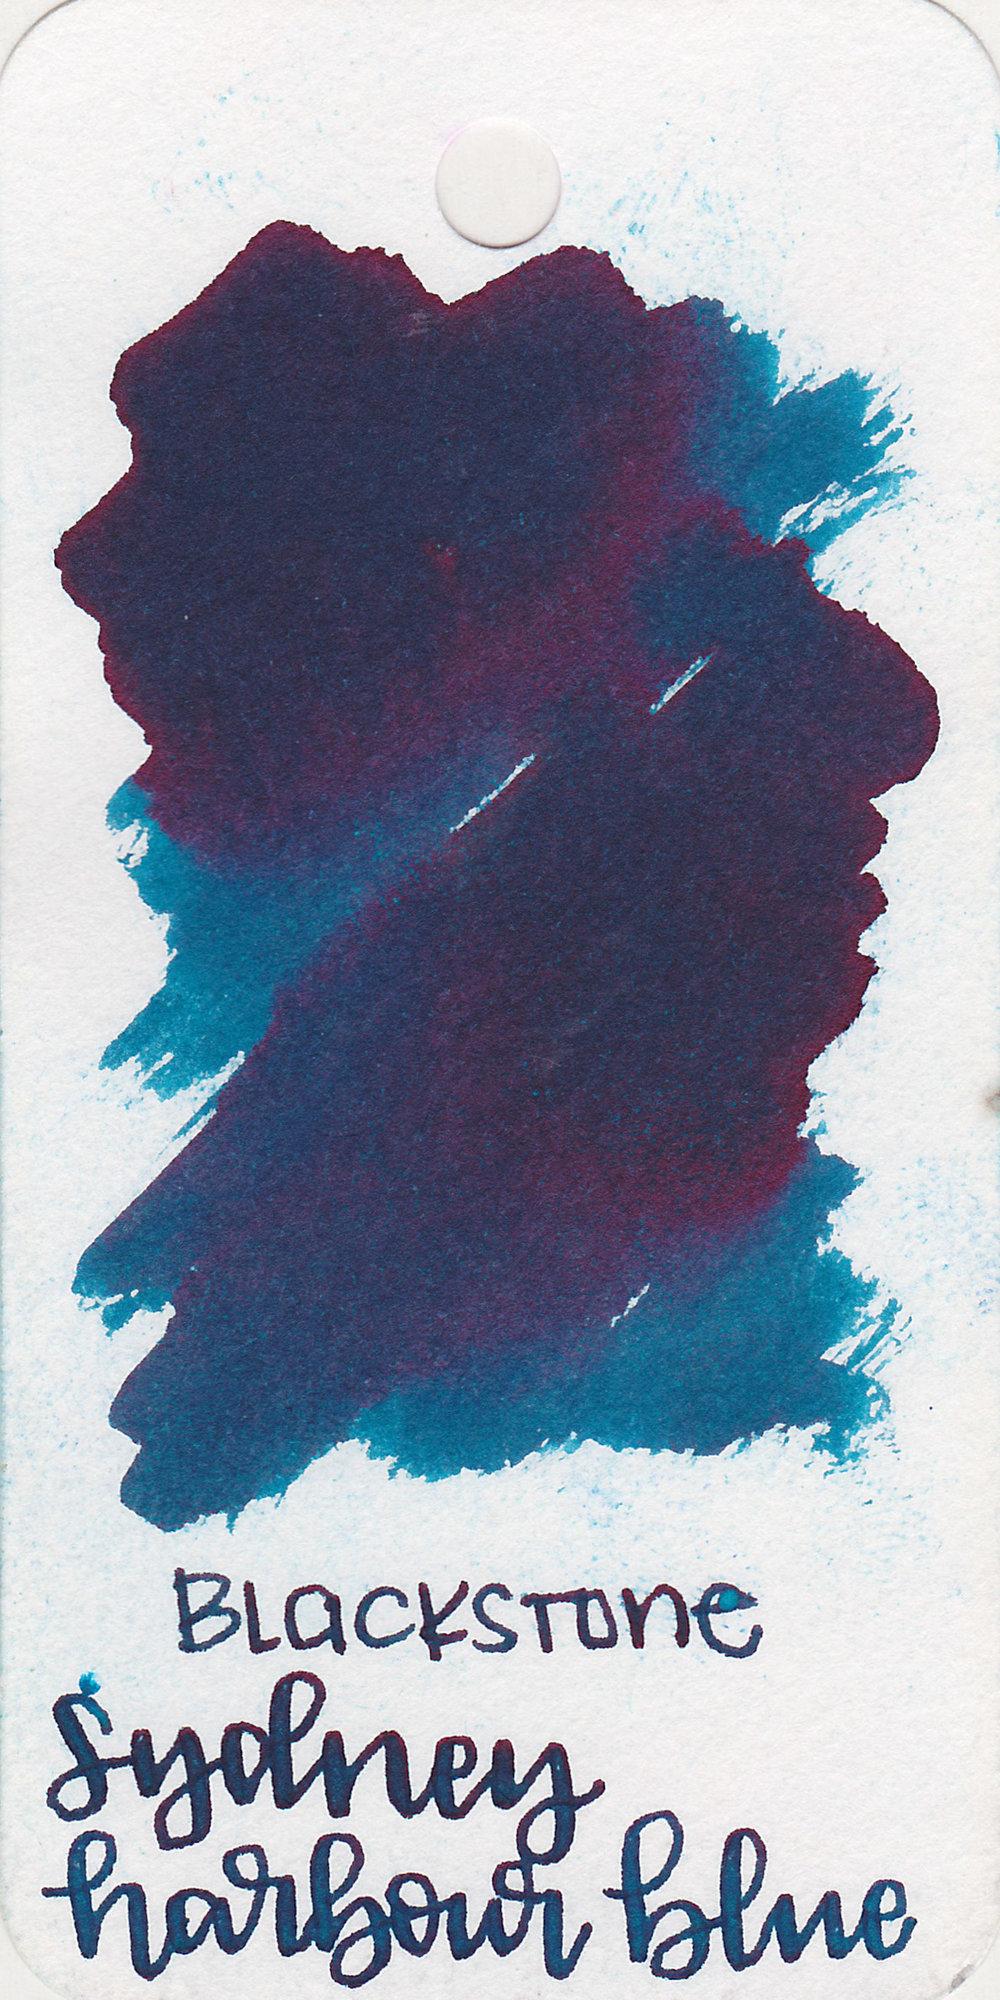 bs-sydney-harbour-blue-1.jpg